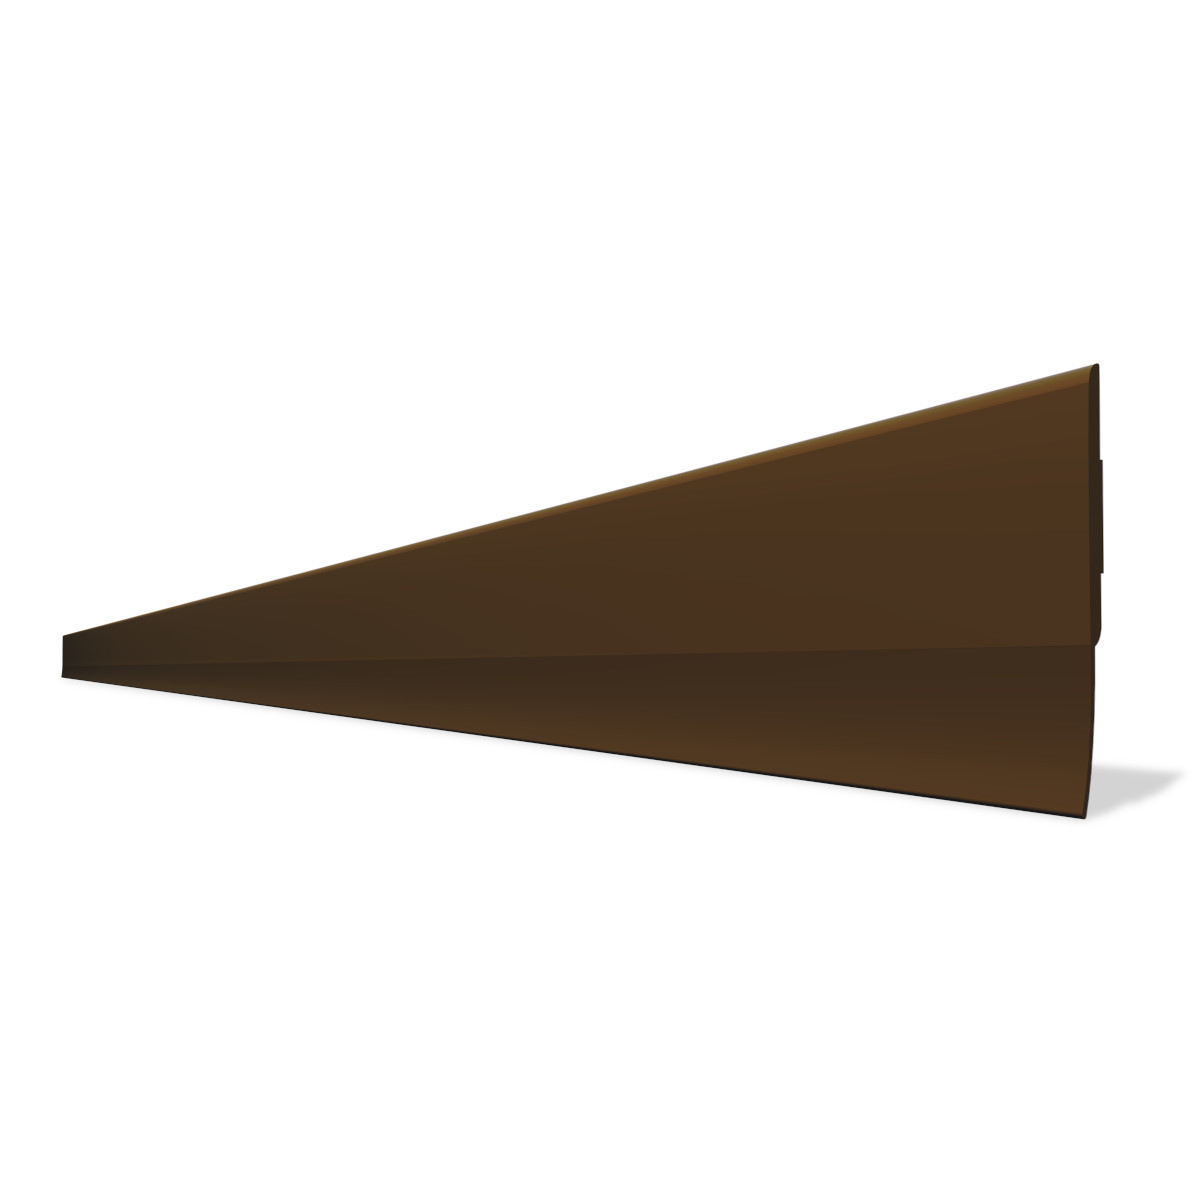 Rodo Veda Porta Slim Fixação Adesivo 100cm - ComfortDoor